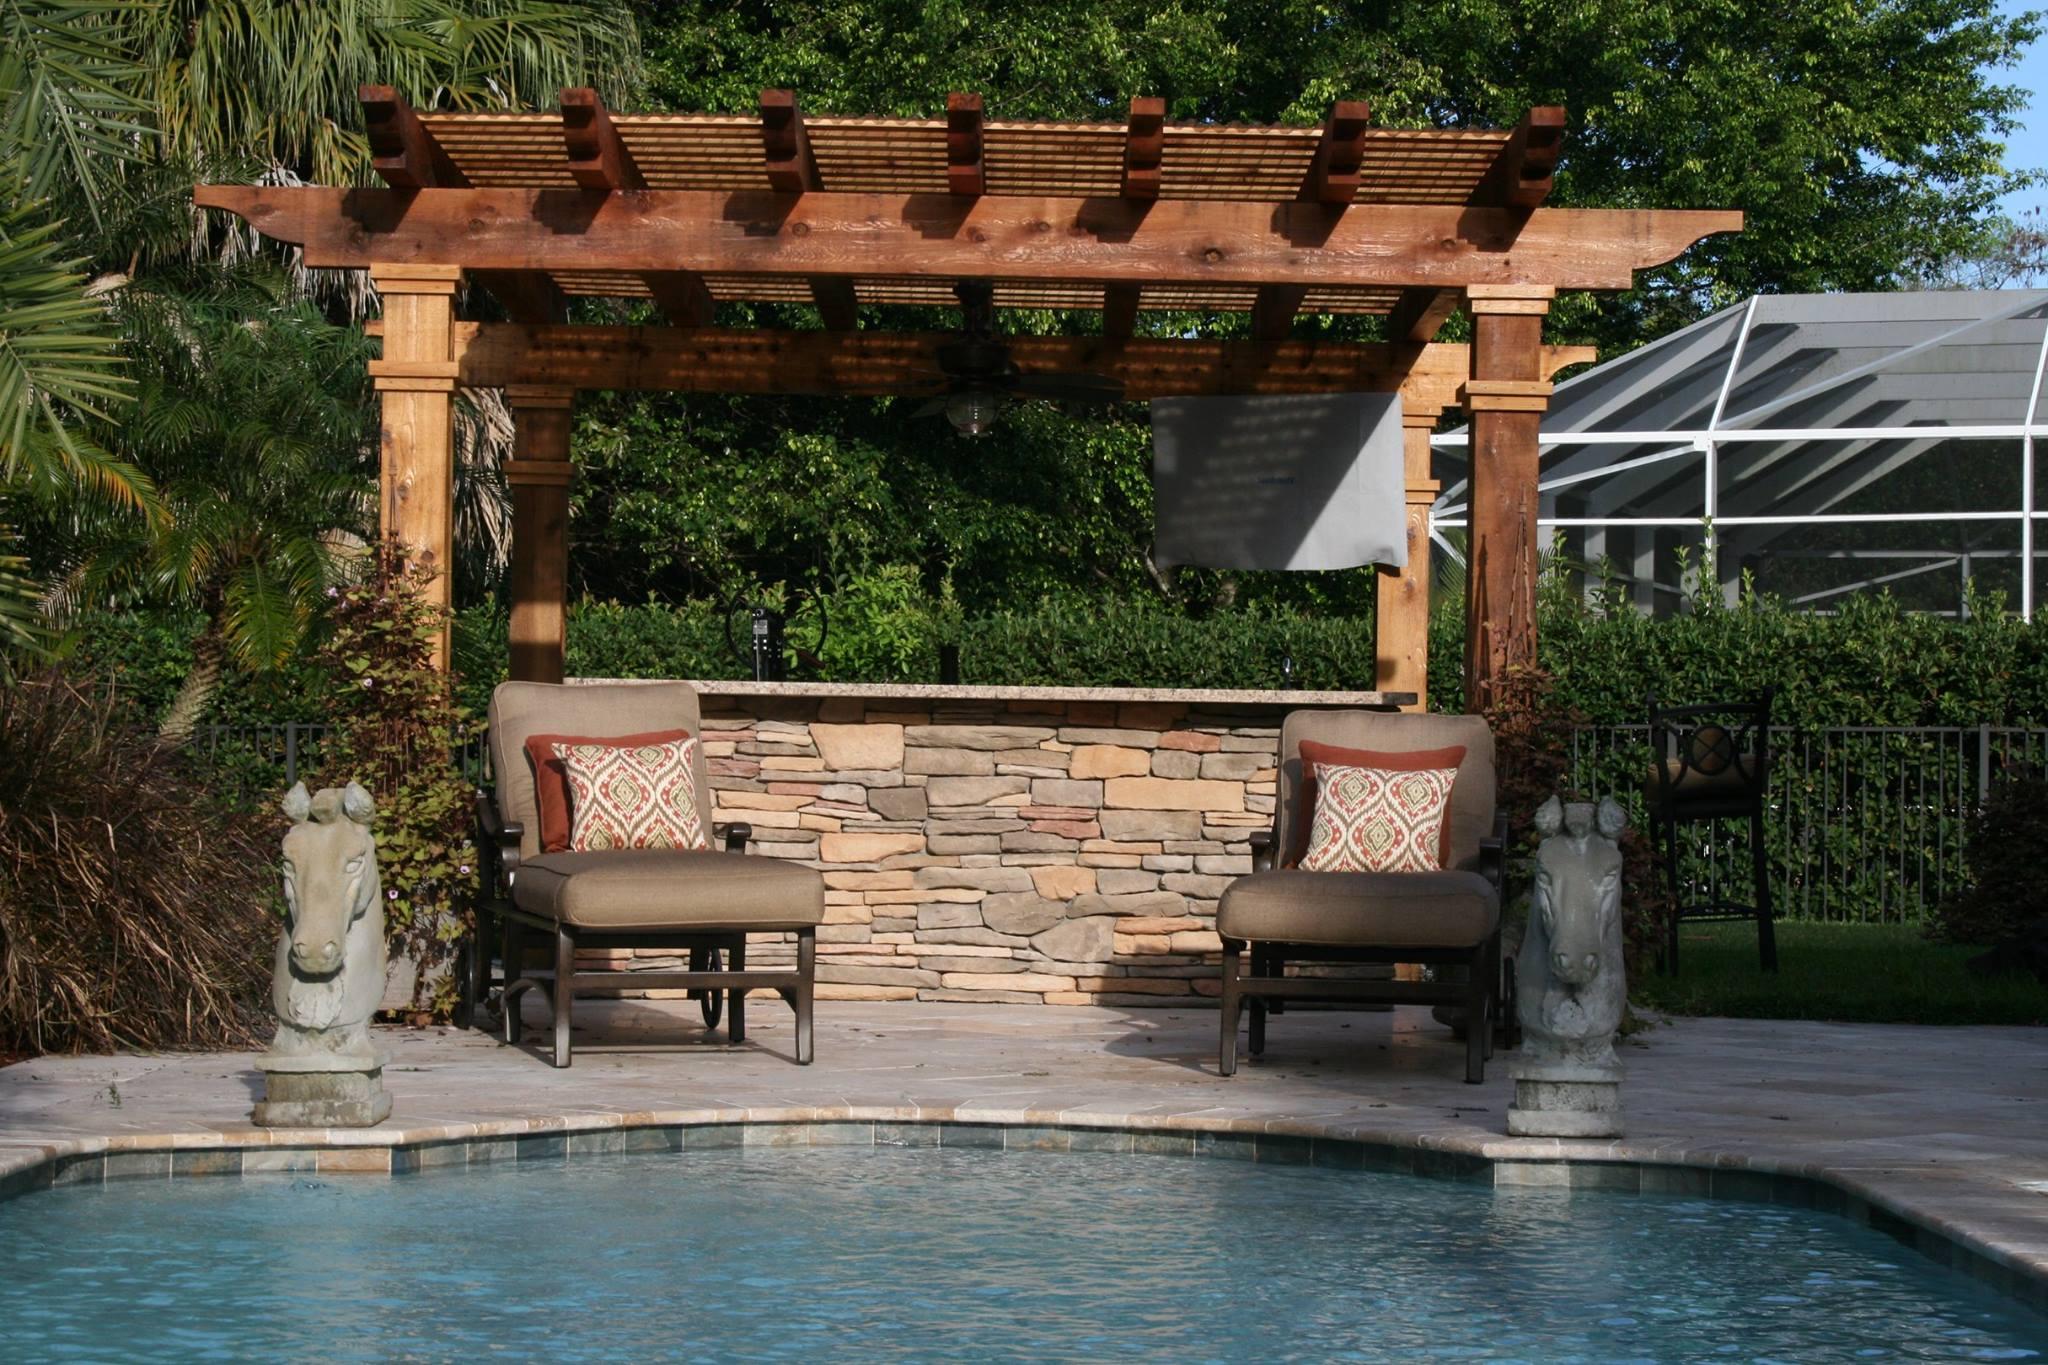 Sunsational Pools & Spas - Loxahatchee Installation